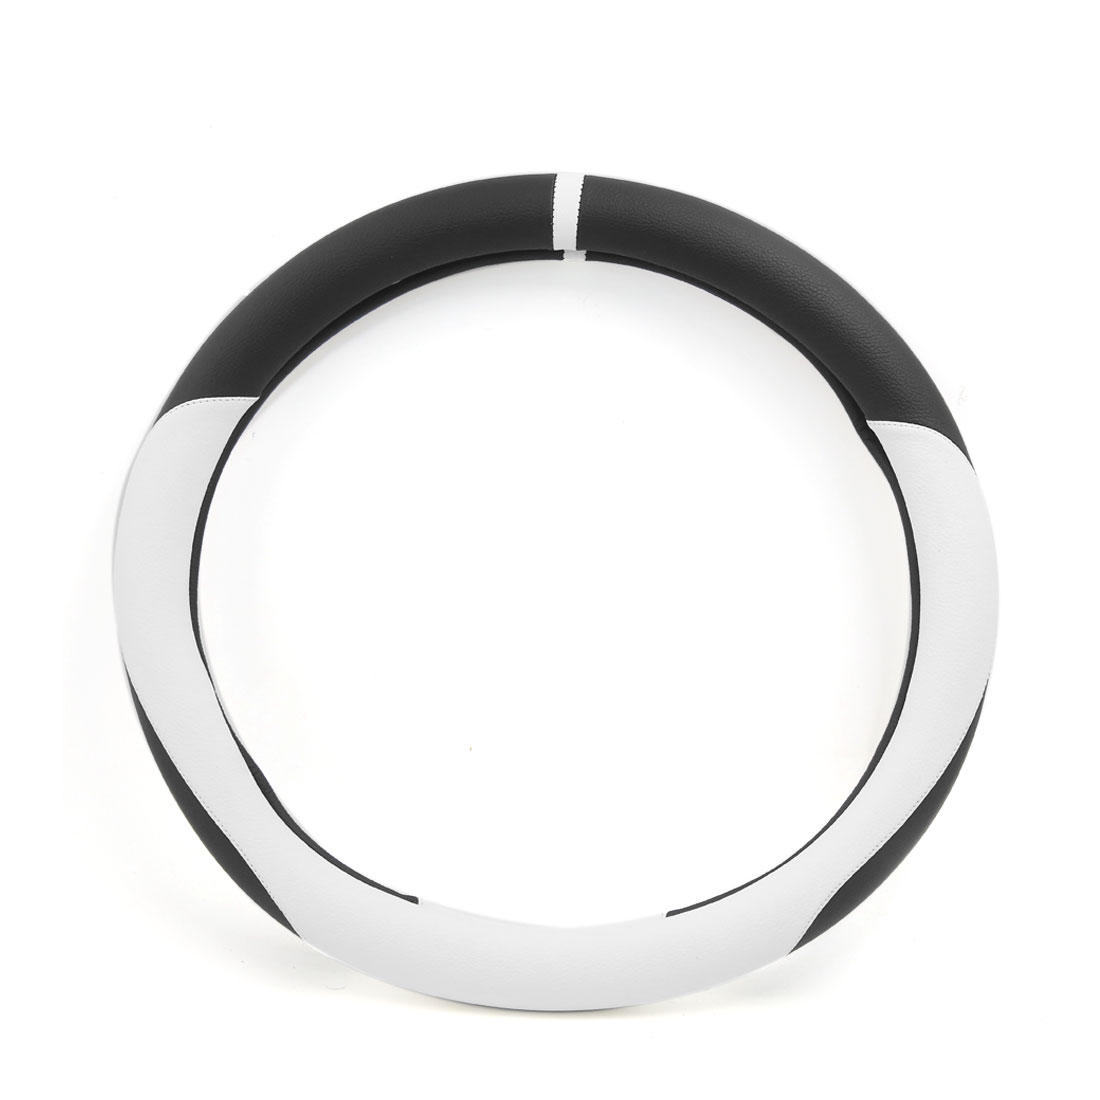 White Black Odorless Anti-slip Cover Wrap for 36cm Dia Truck Car Steering Wheel - image 2 of 2